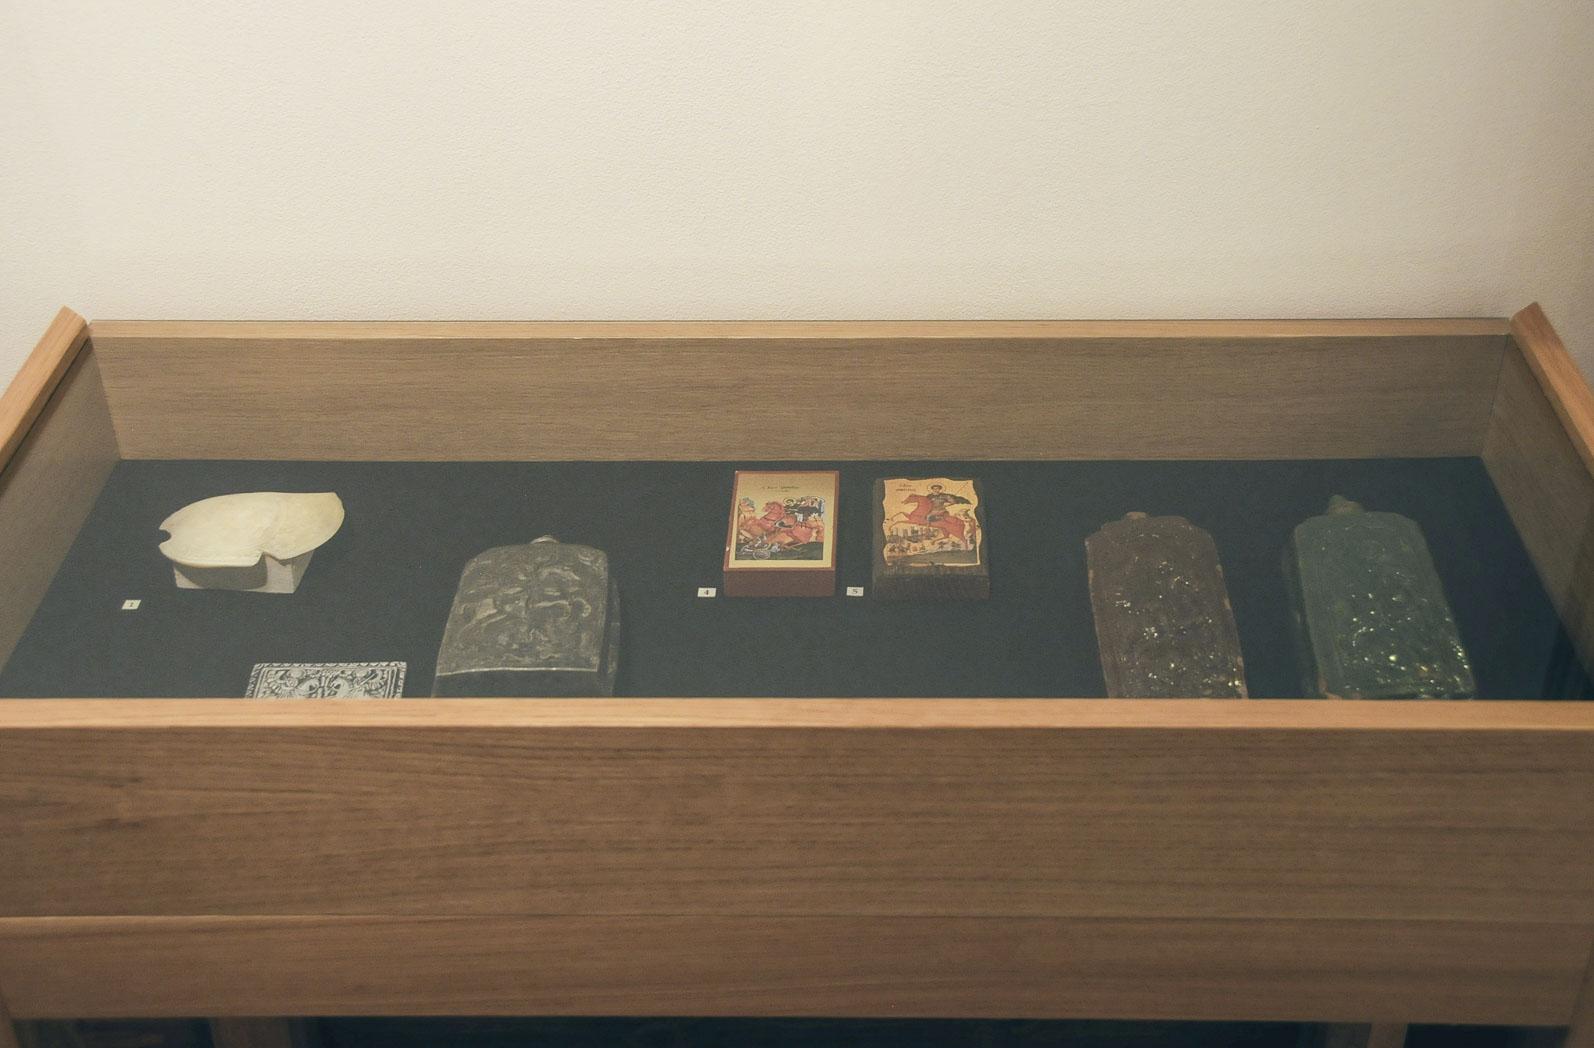 troyan-museum-jivotat-na-edna-idea-38